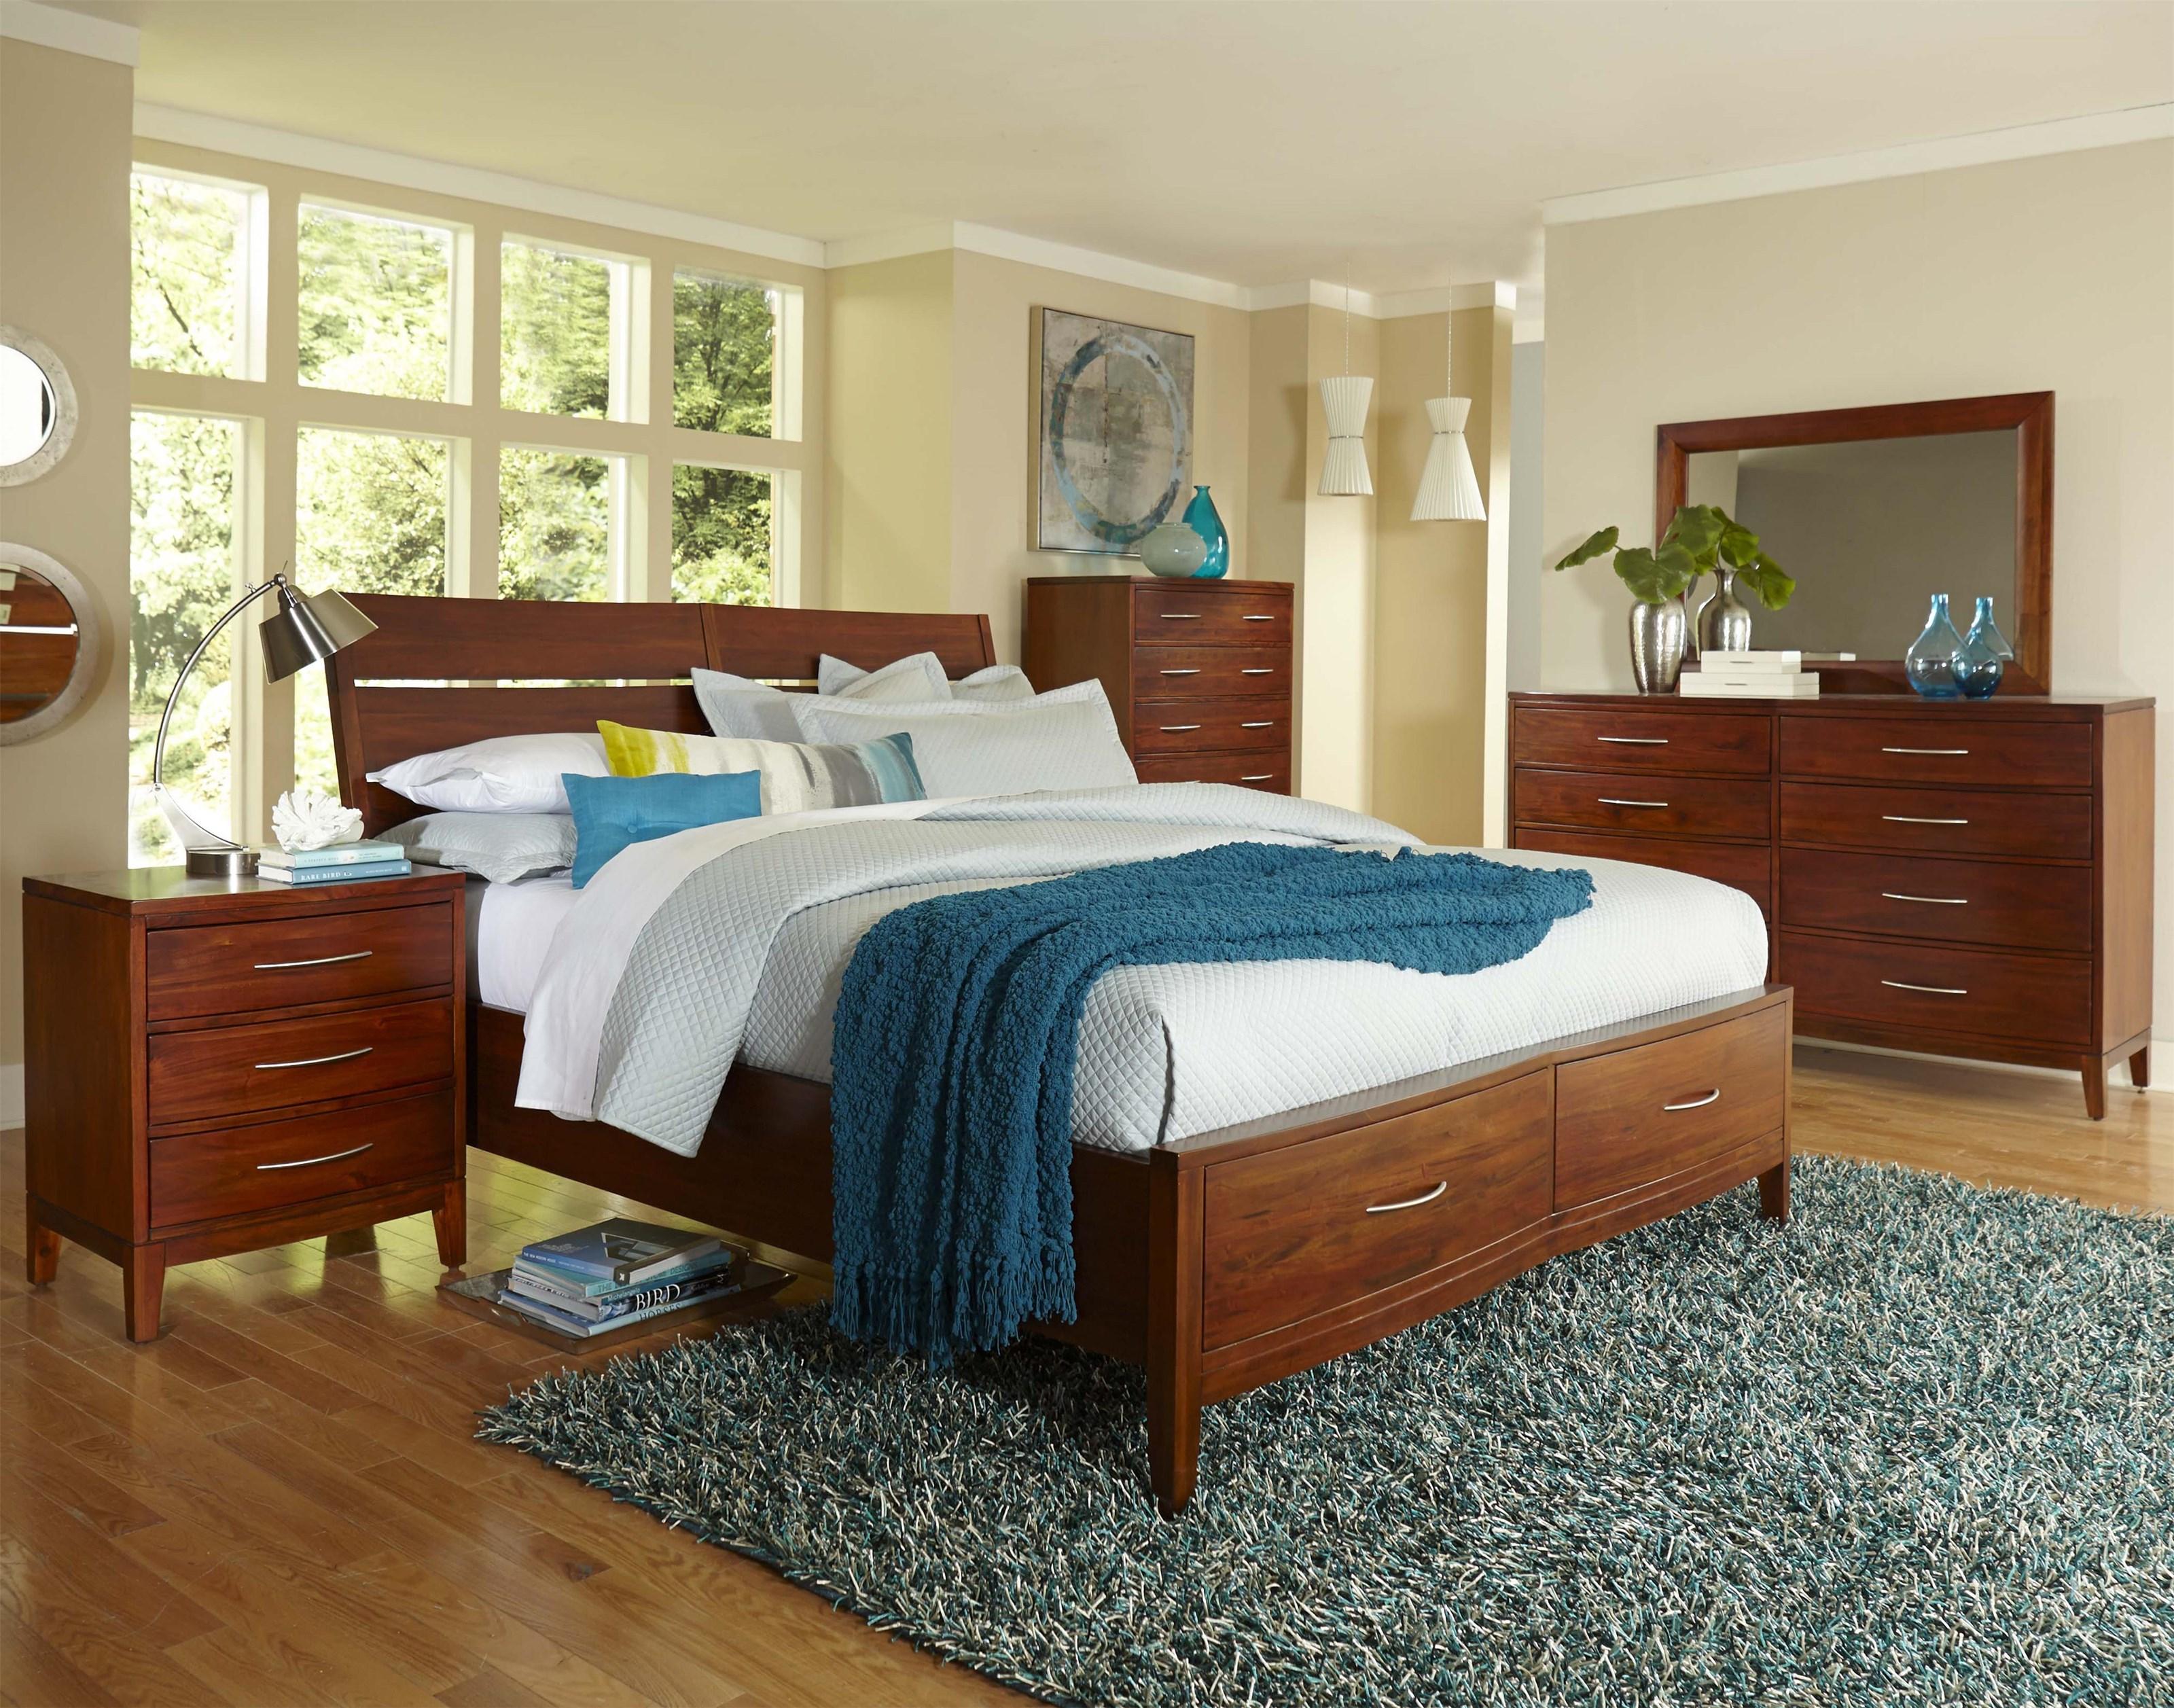 Superbe Napa Furniture Designs Boston Brownstone Queen Storage Bed | HomeWorld  Furniture | Platform Beds/Low Profile Beds